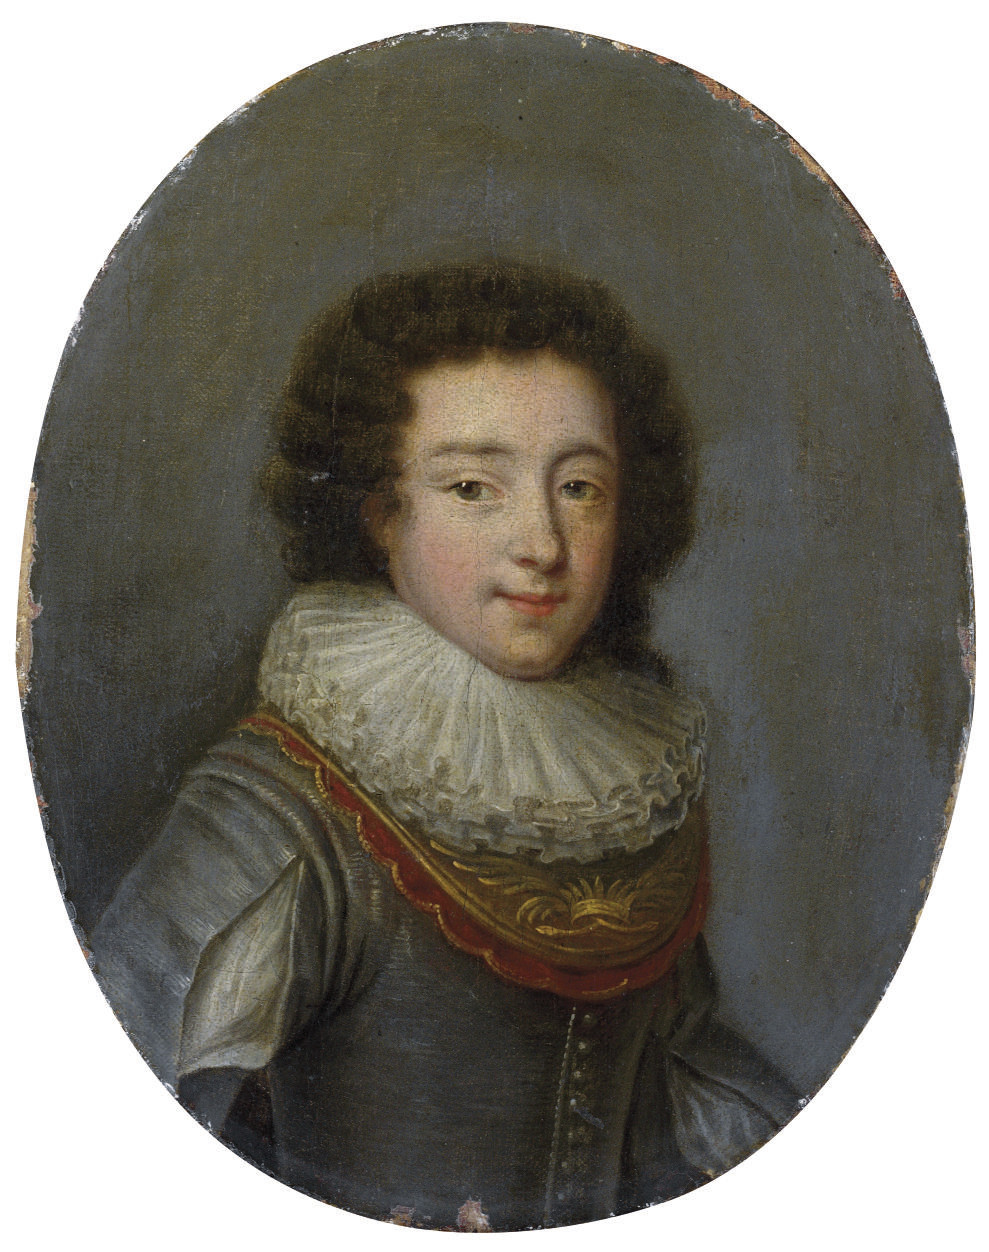 Follower of Frans Pourbus